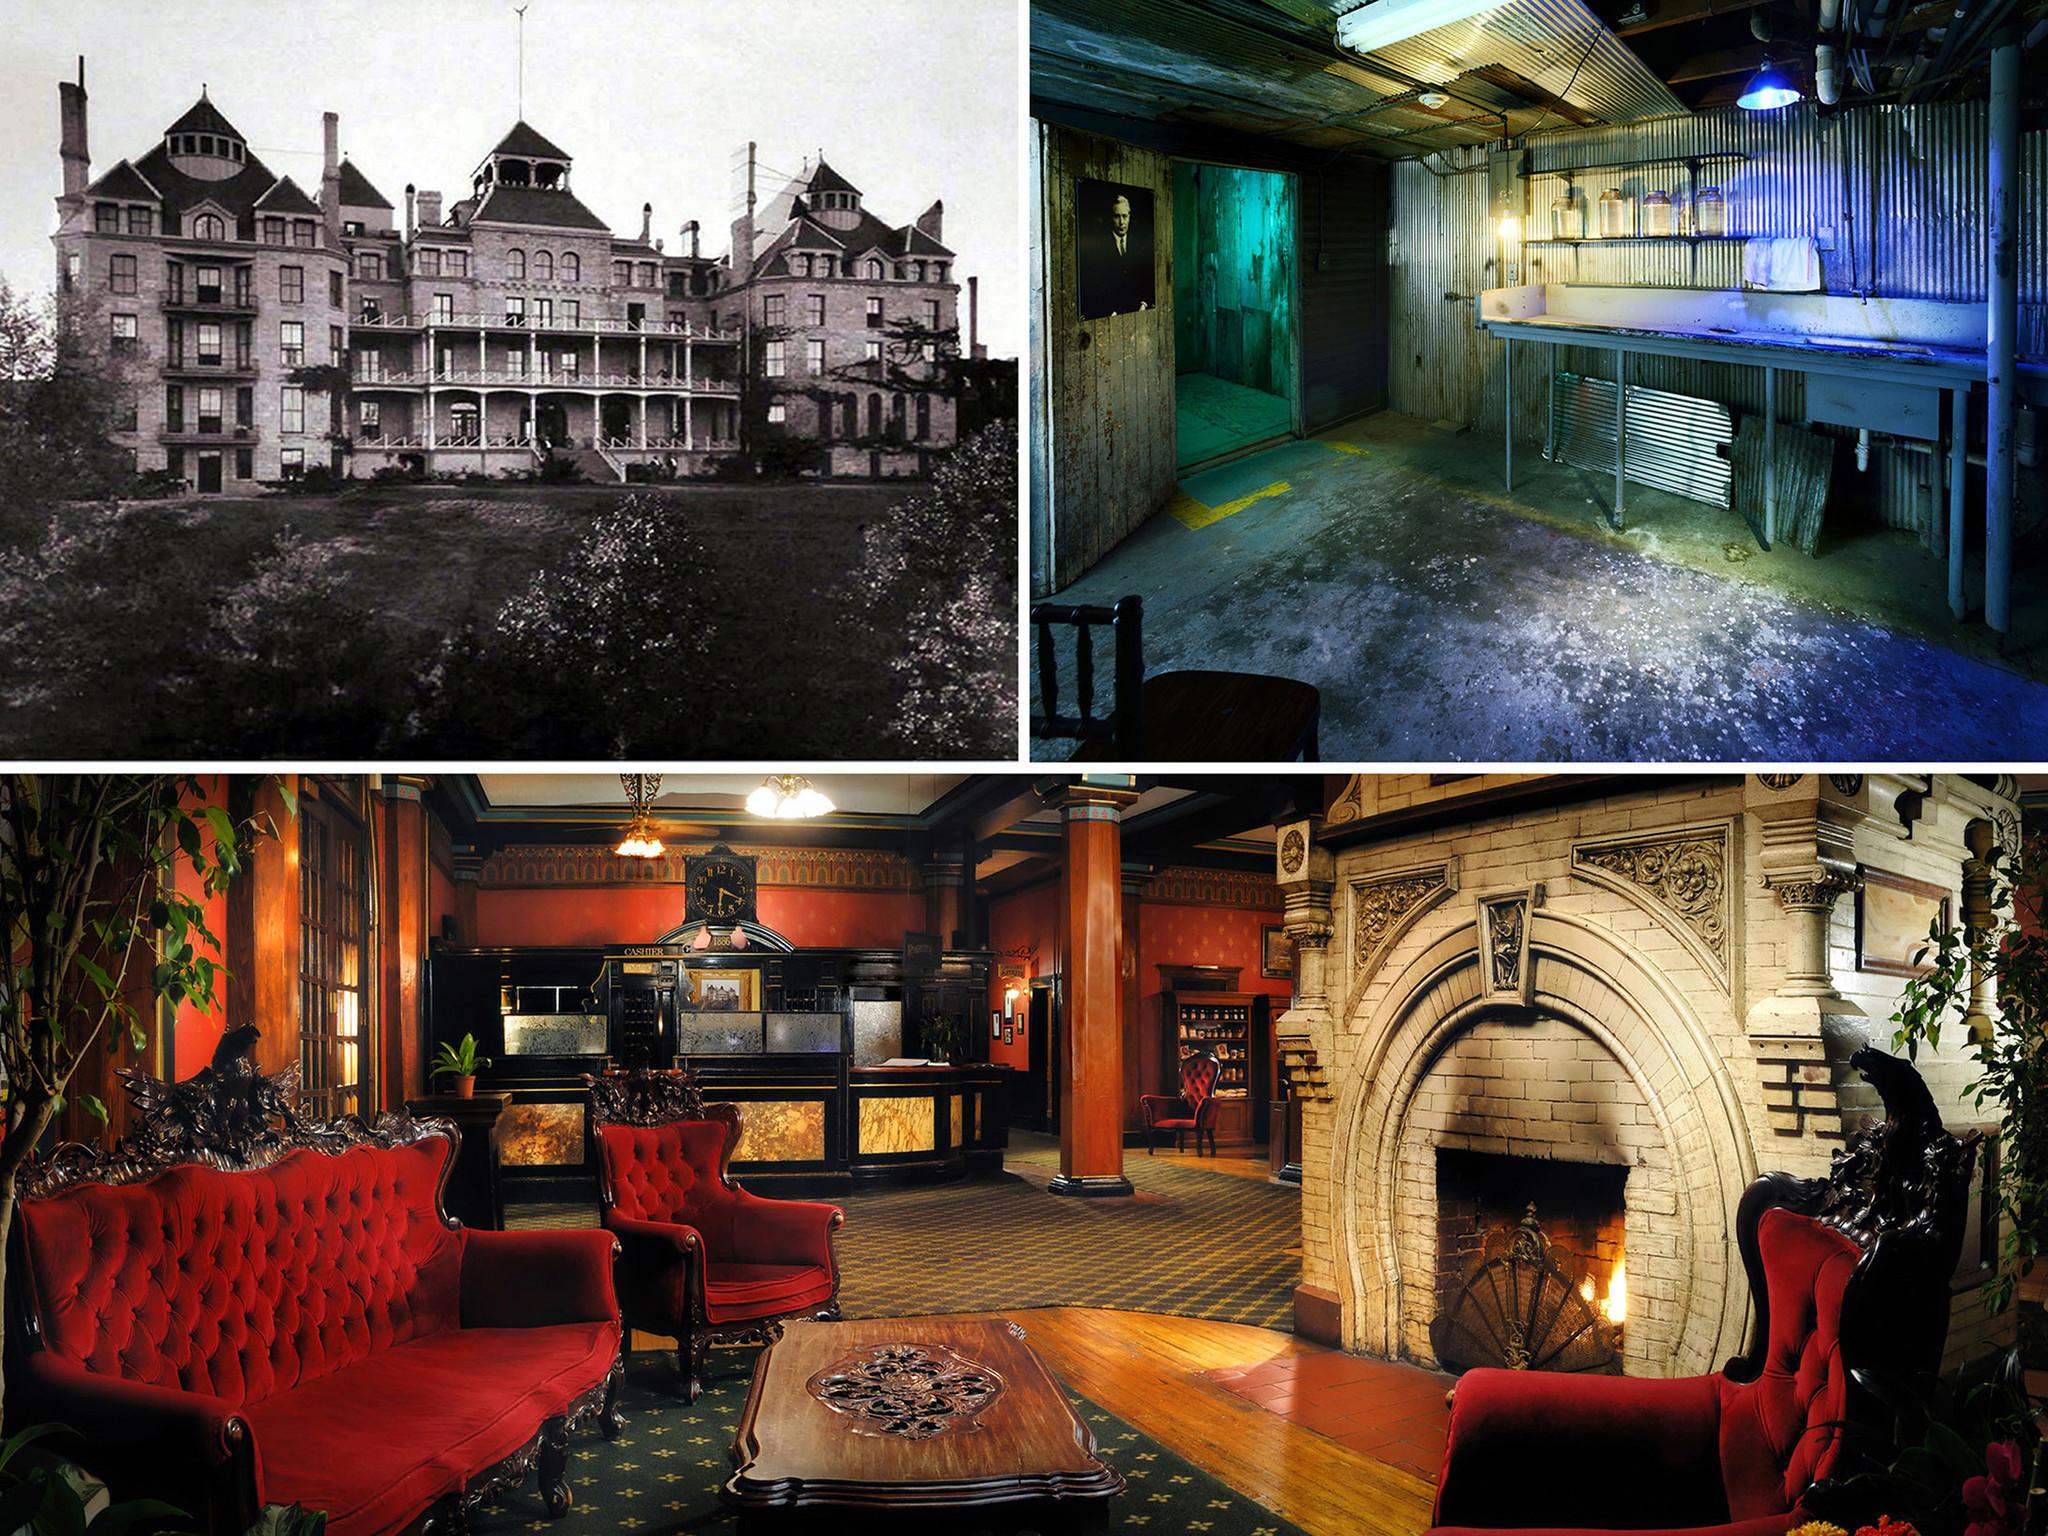 Haunted hotels turn horror into hard cash - Chicago Tribune